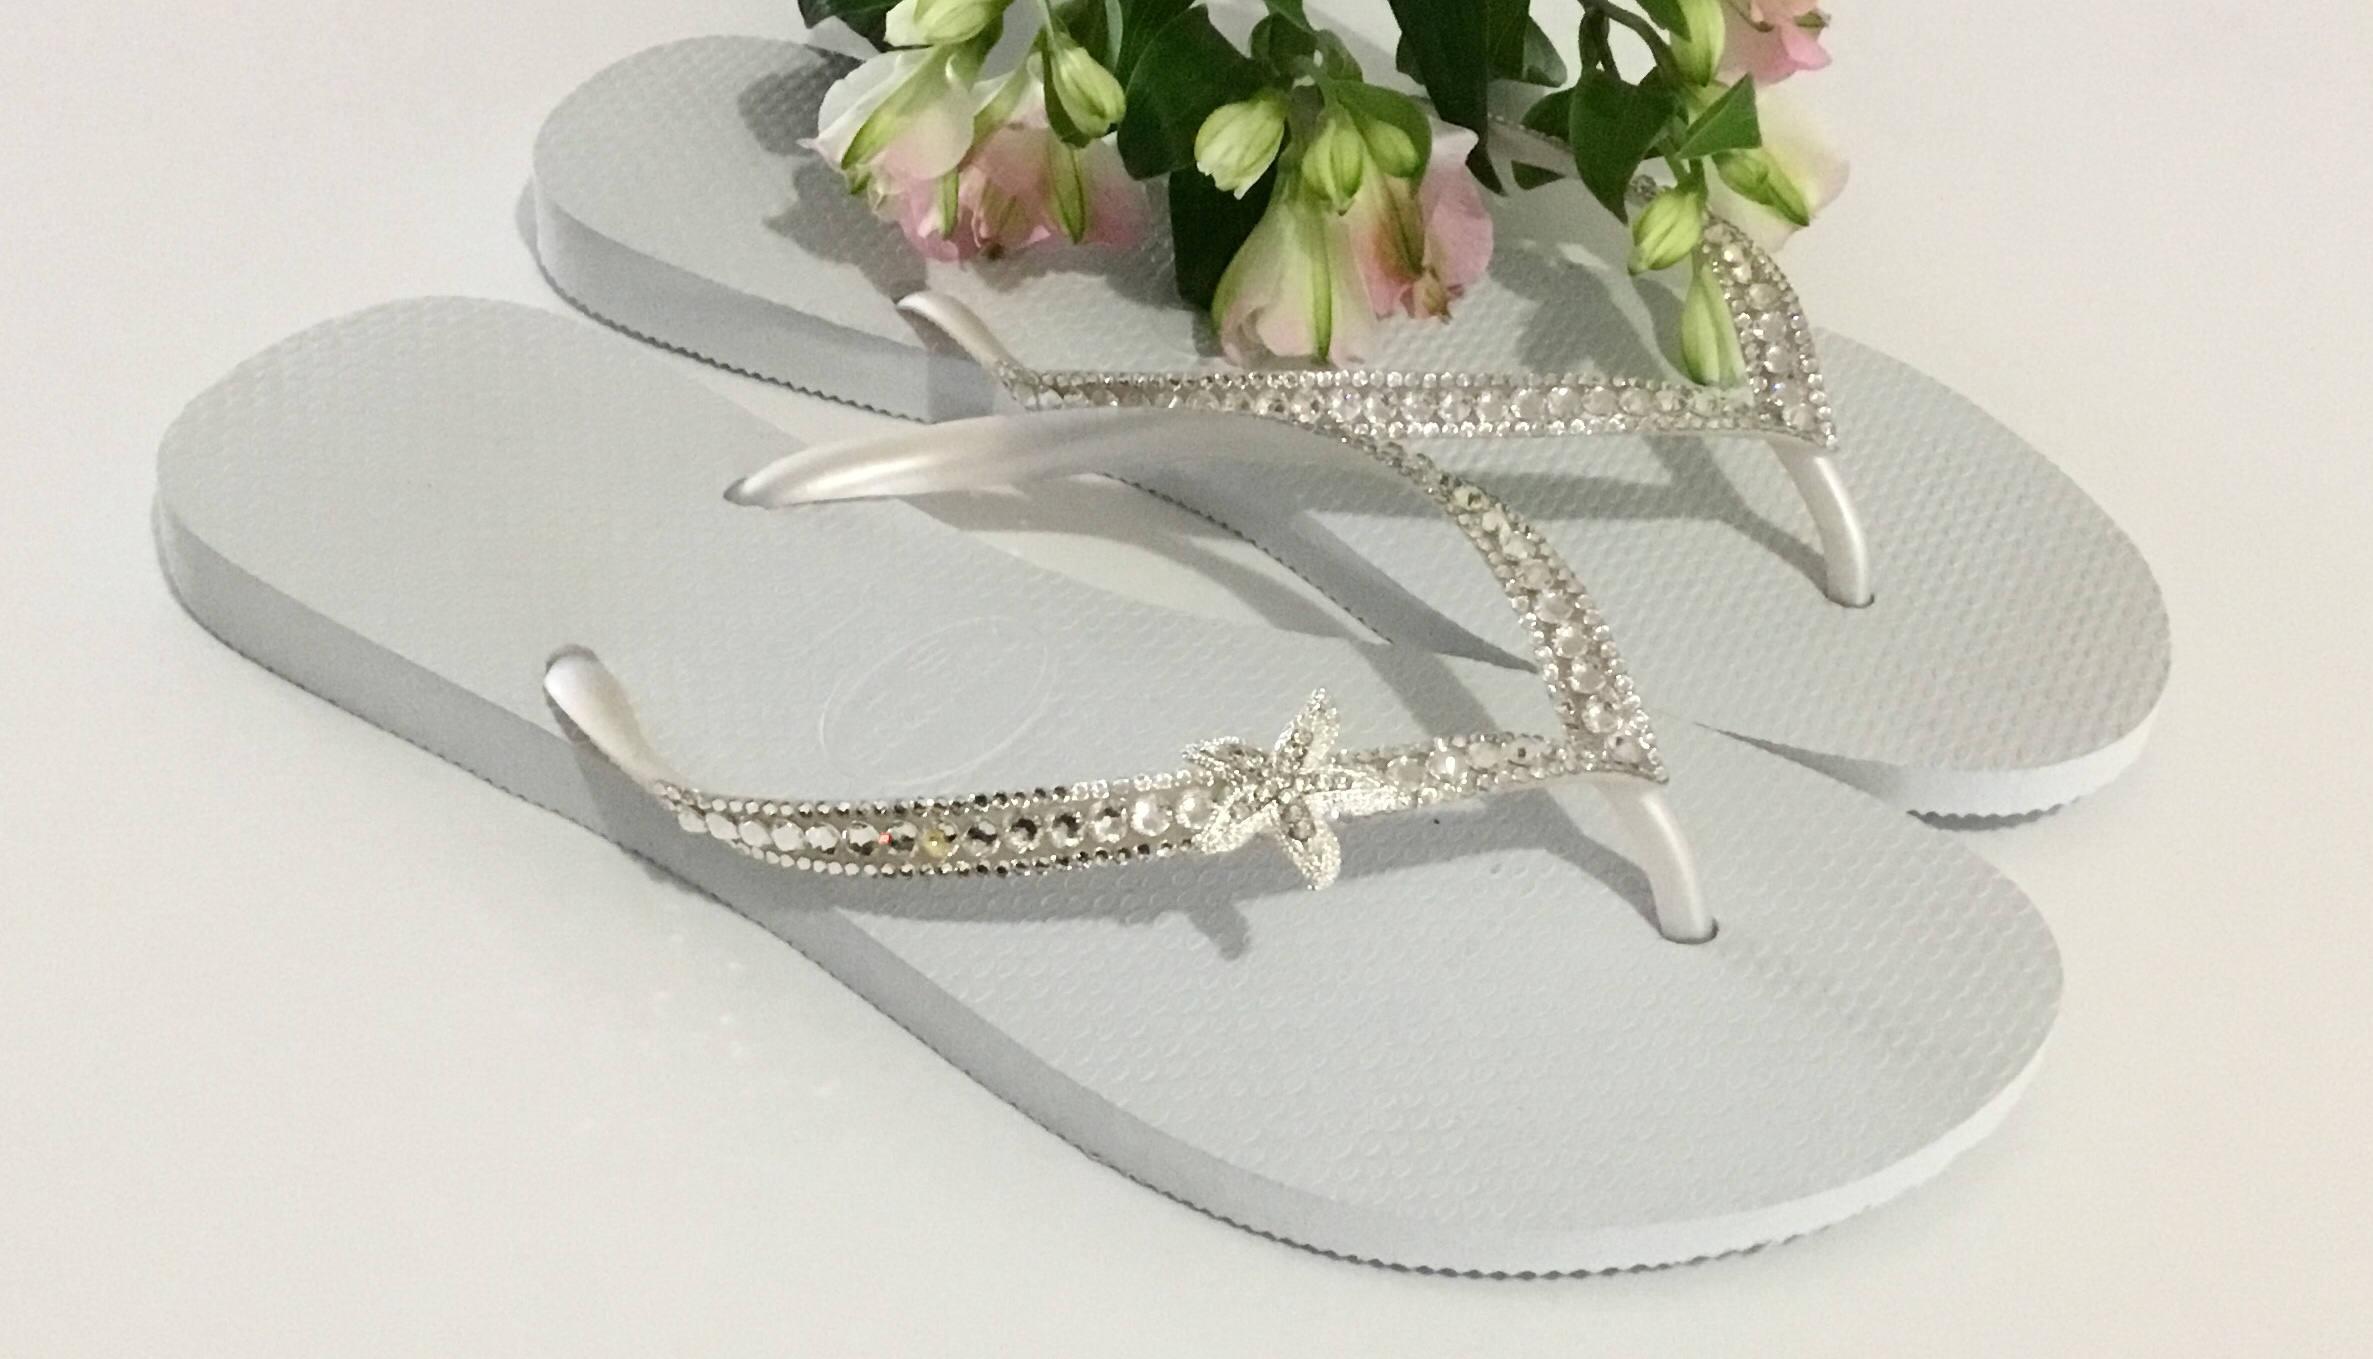 362caf15f613 Custom Crystal Havaianas Slim White flip flops Silver starfish ocean ...